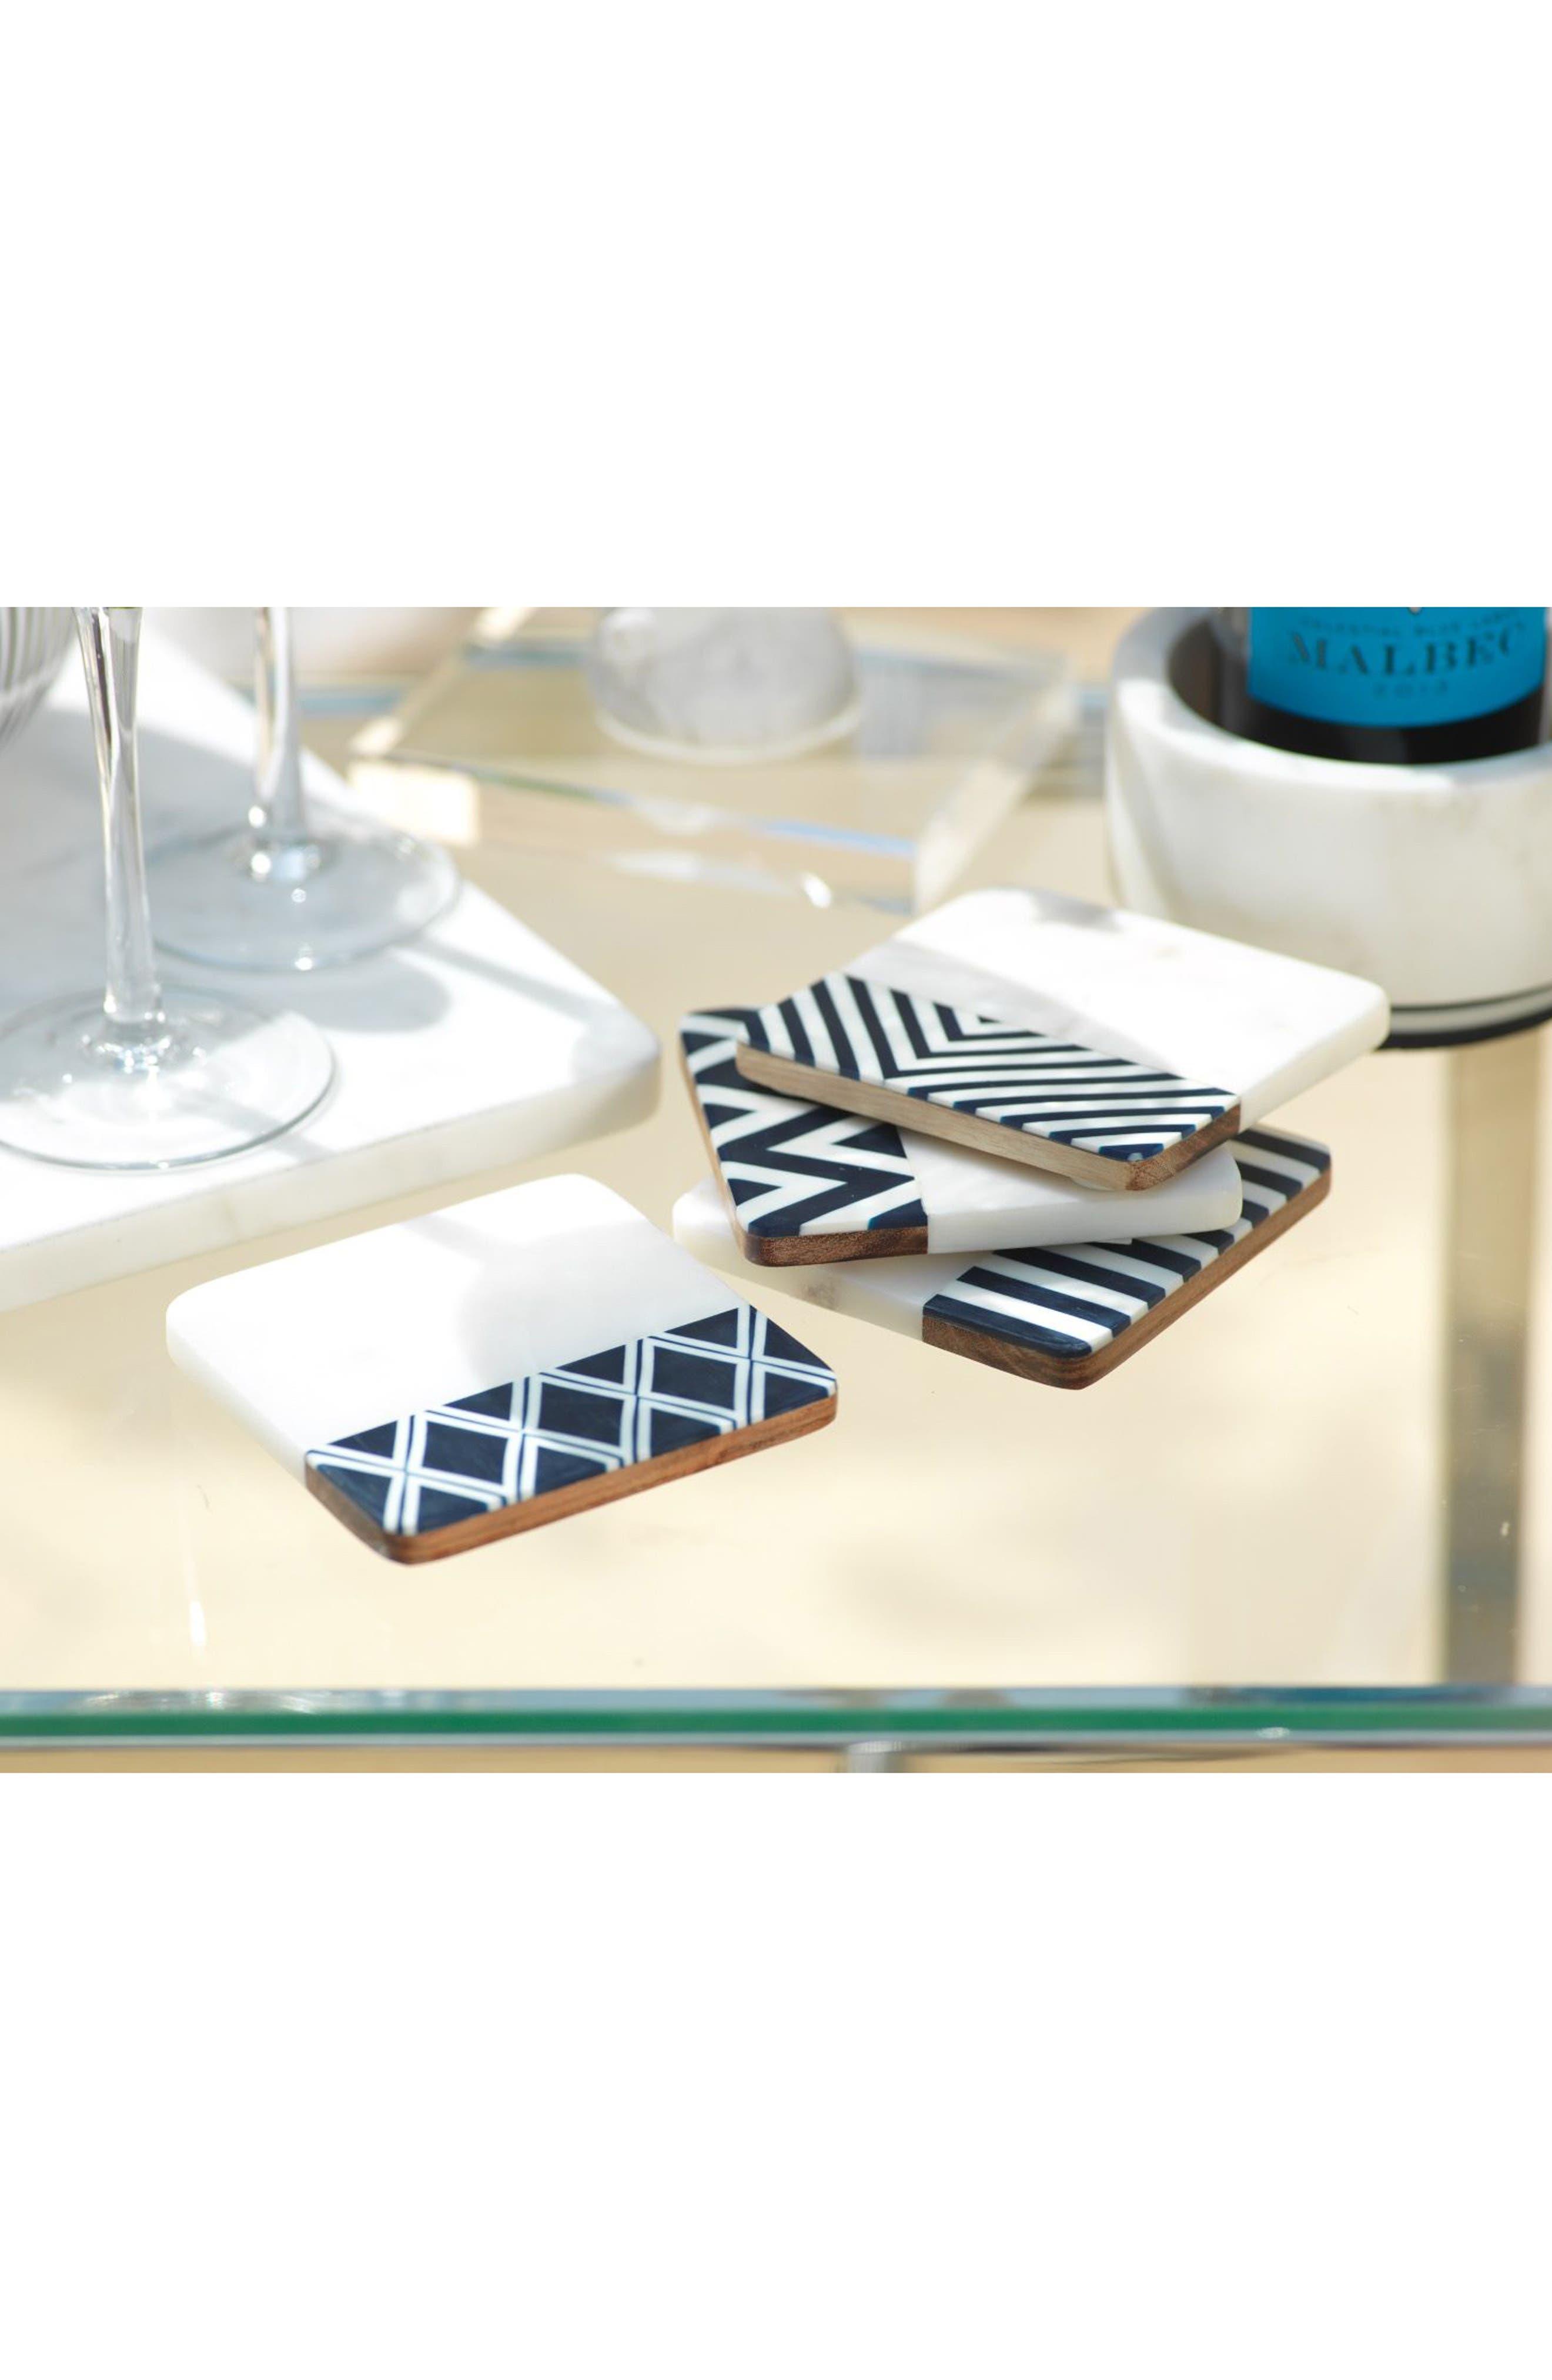 Marine Set of 4 Wood & Marble Coasters,                             Alternate thumbnail 2, color,                             WHITE/ GREY/ BLACK